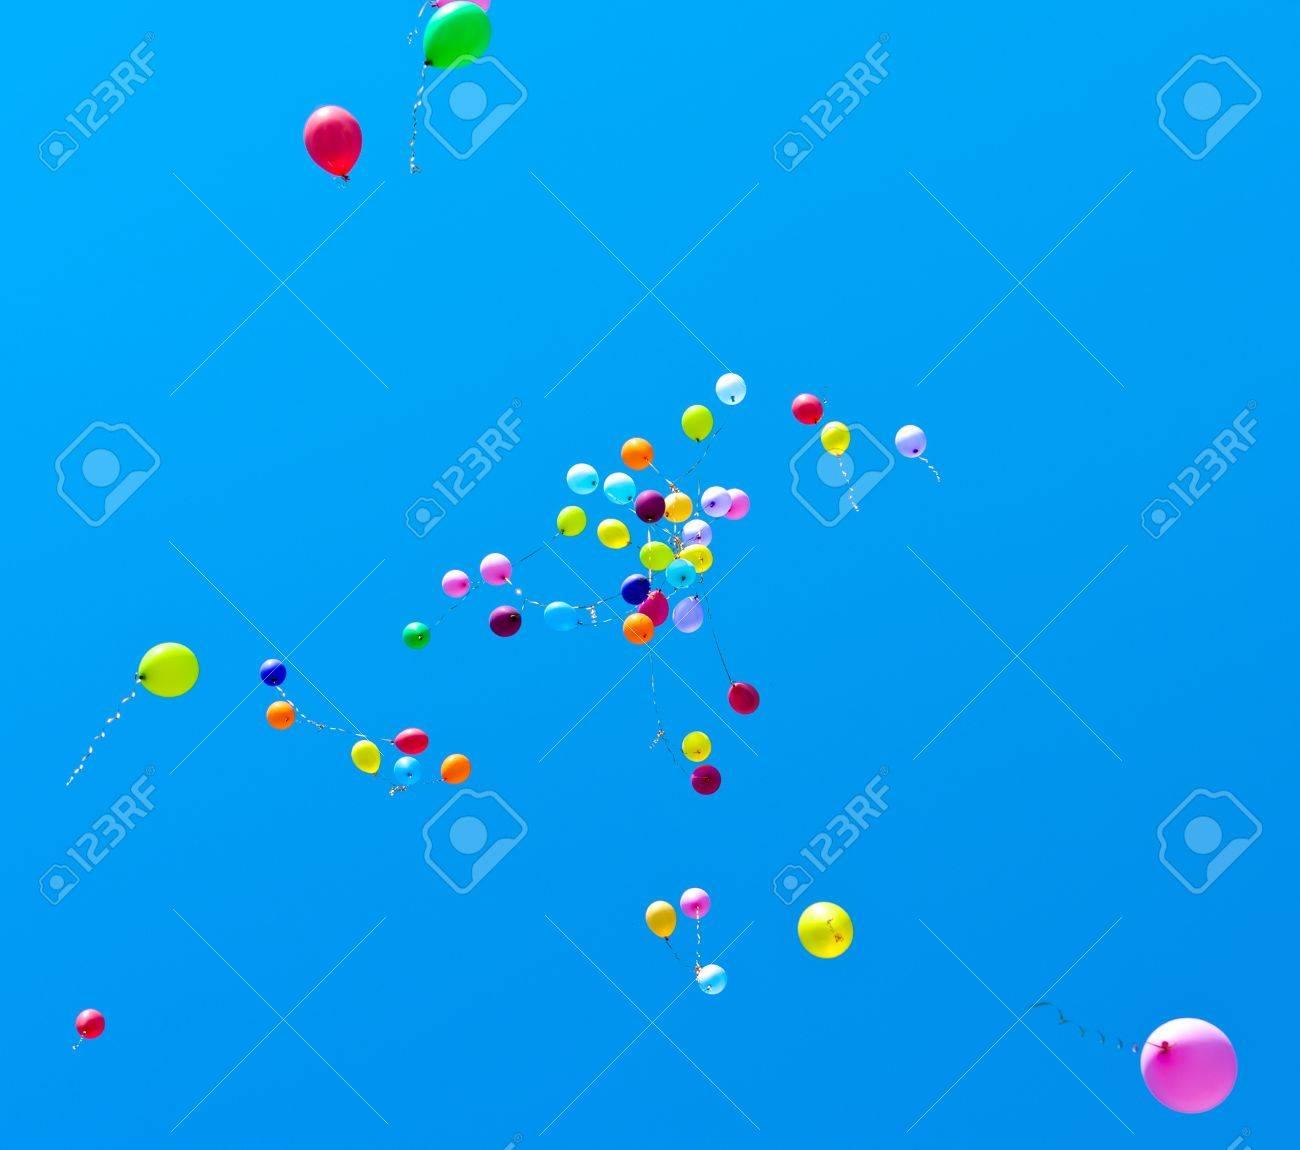 Many balloons fly into the blue sky - 9615632